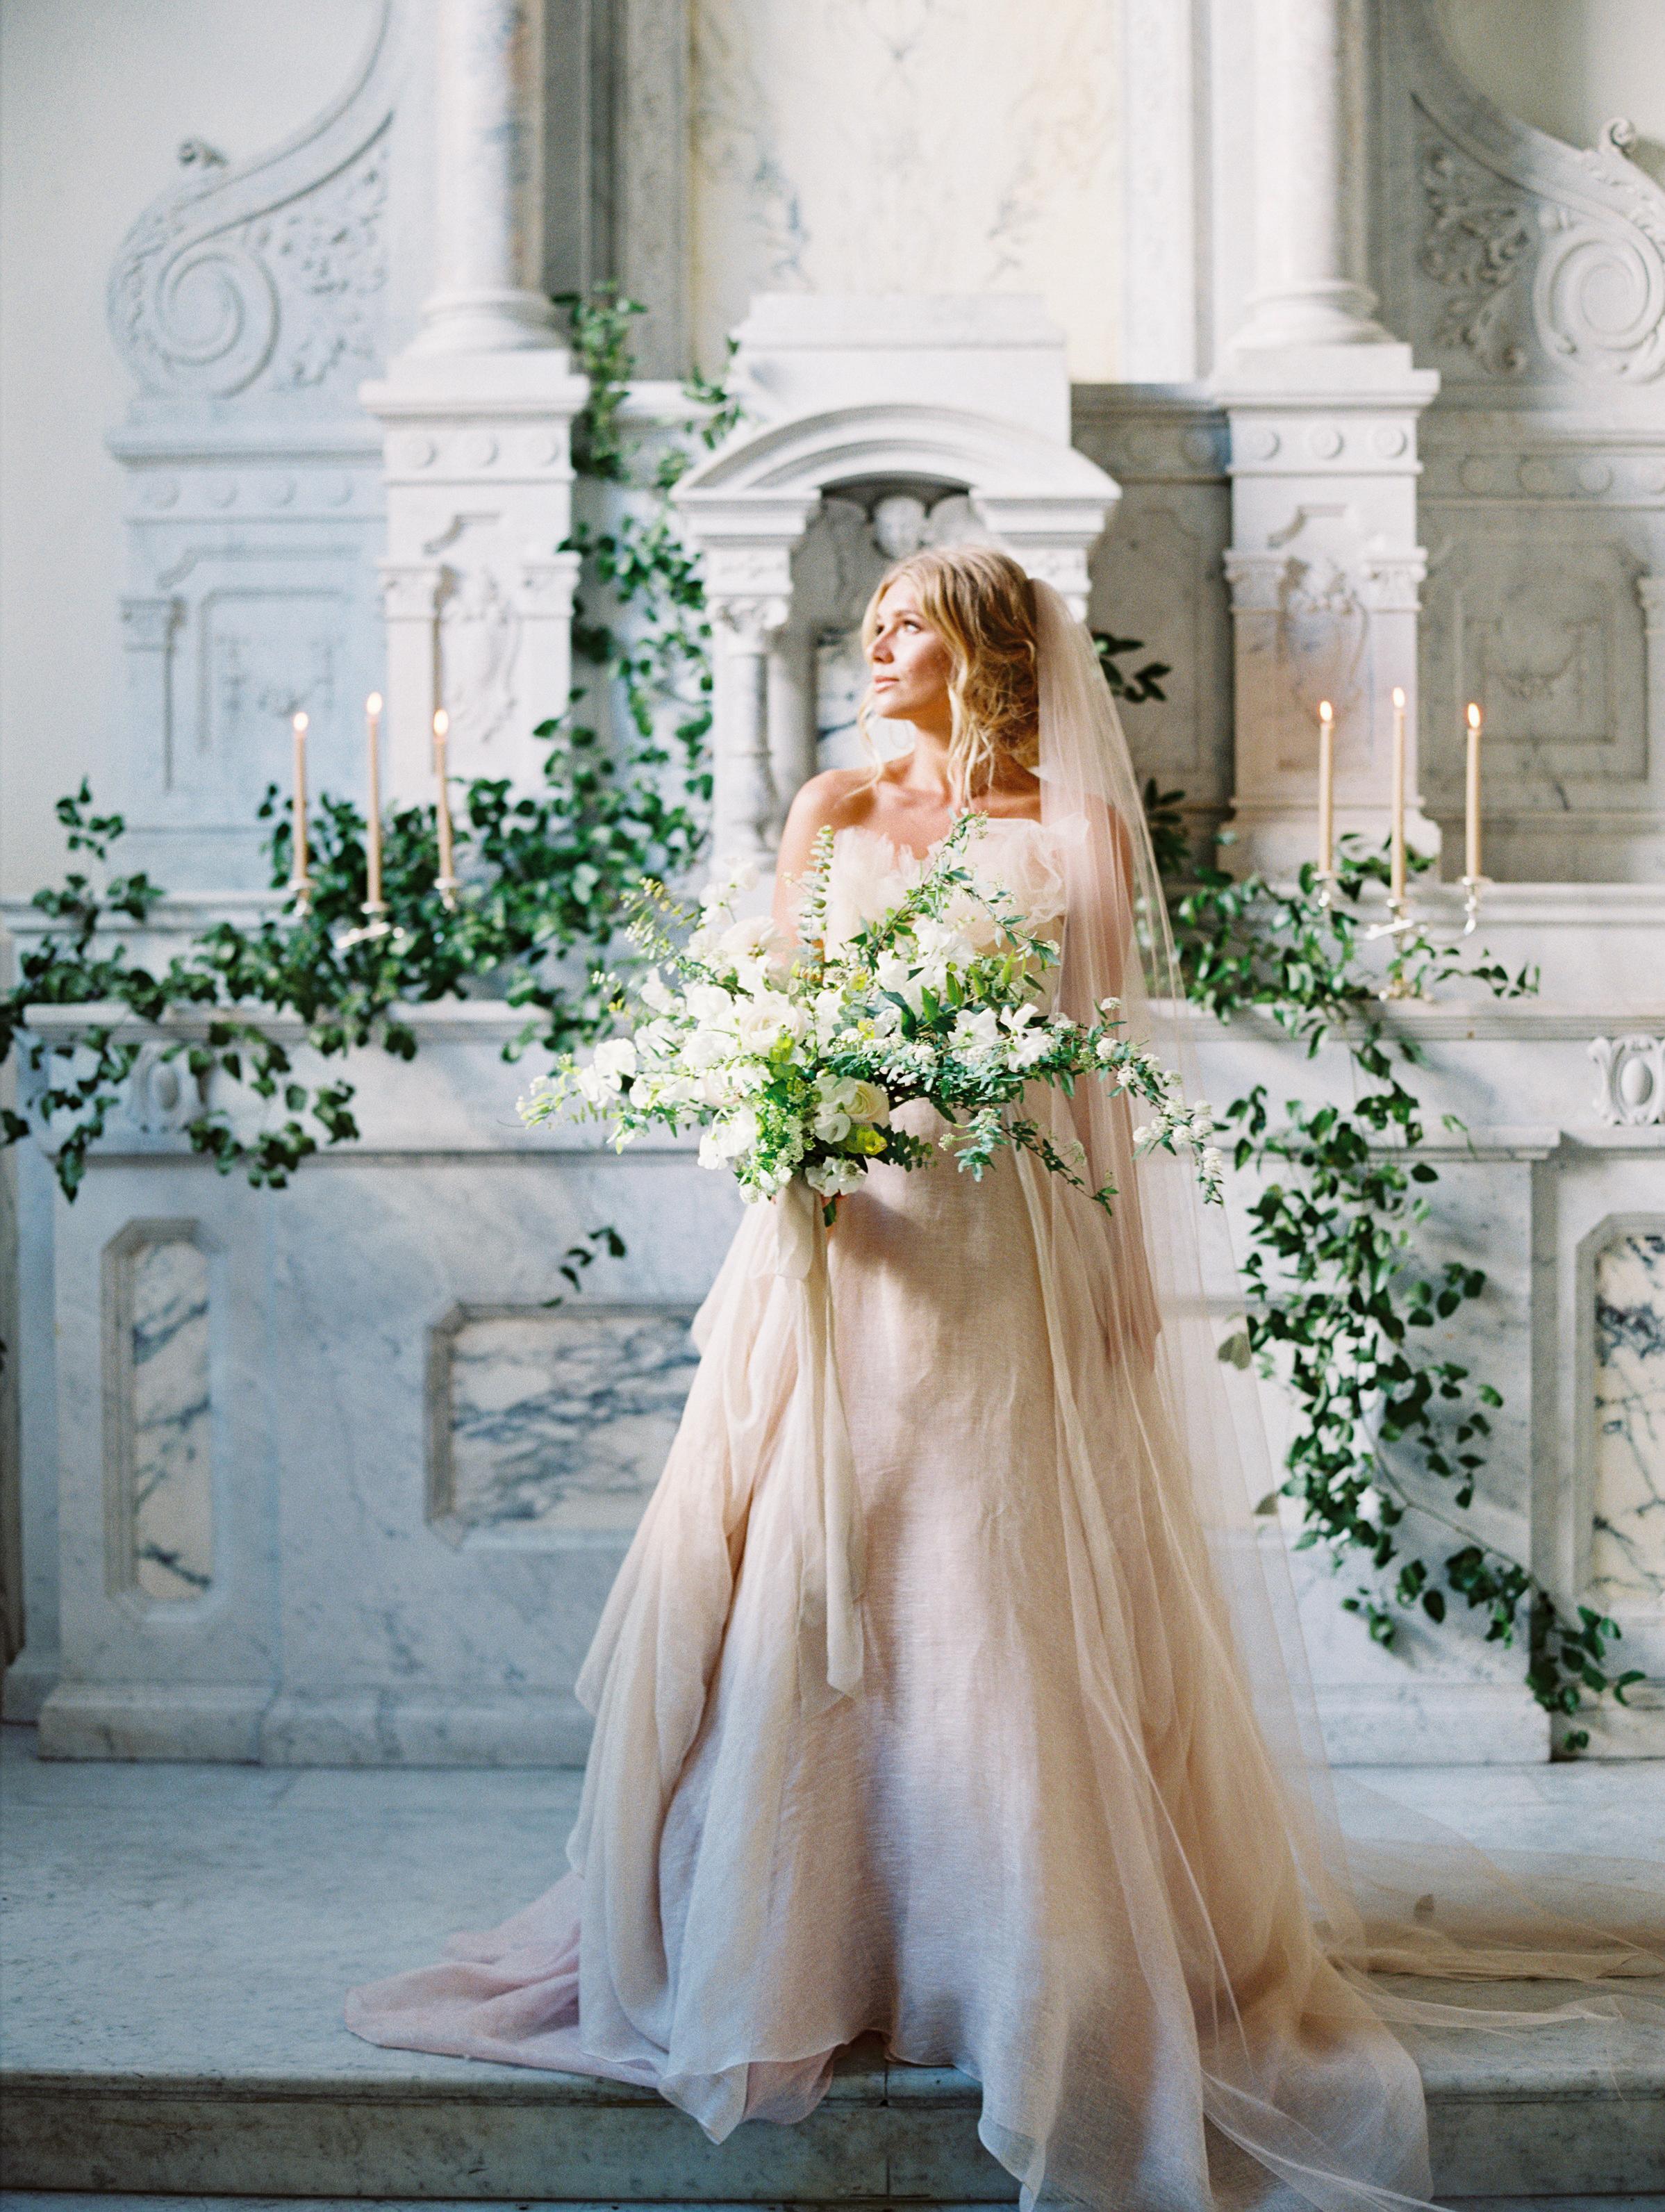 Carol Hannah Bridal Grand Palais Gown VibianabyValentinaGlidden_194.jpg